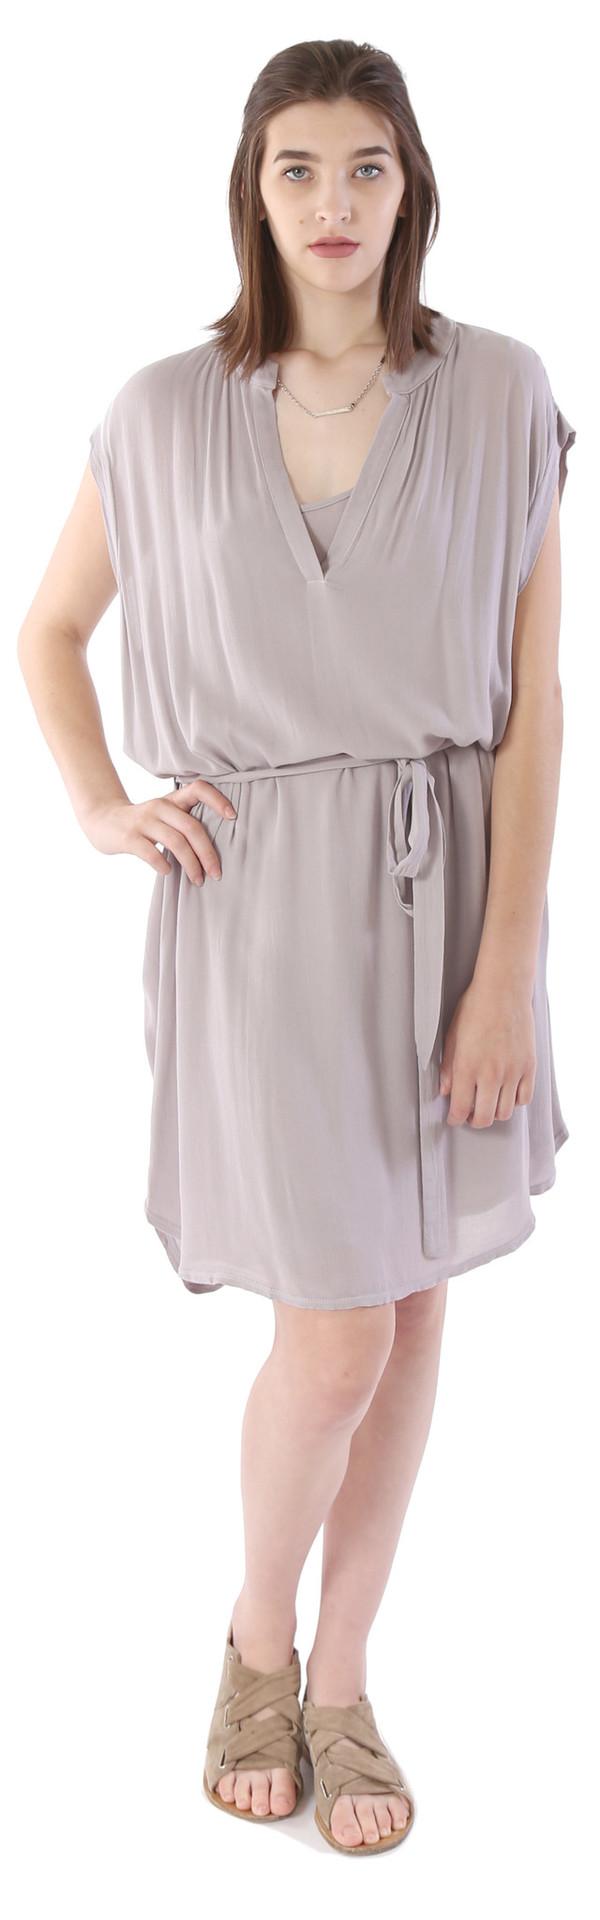 Lanston Sleeveless Dress in Stone